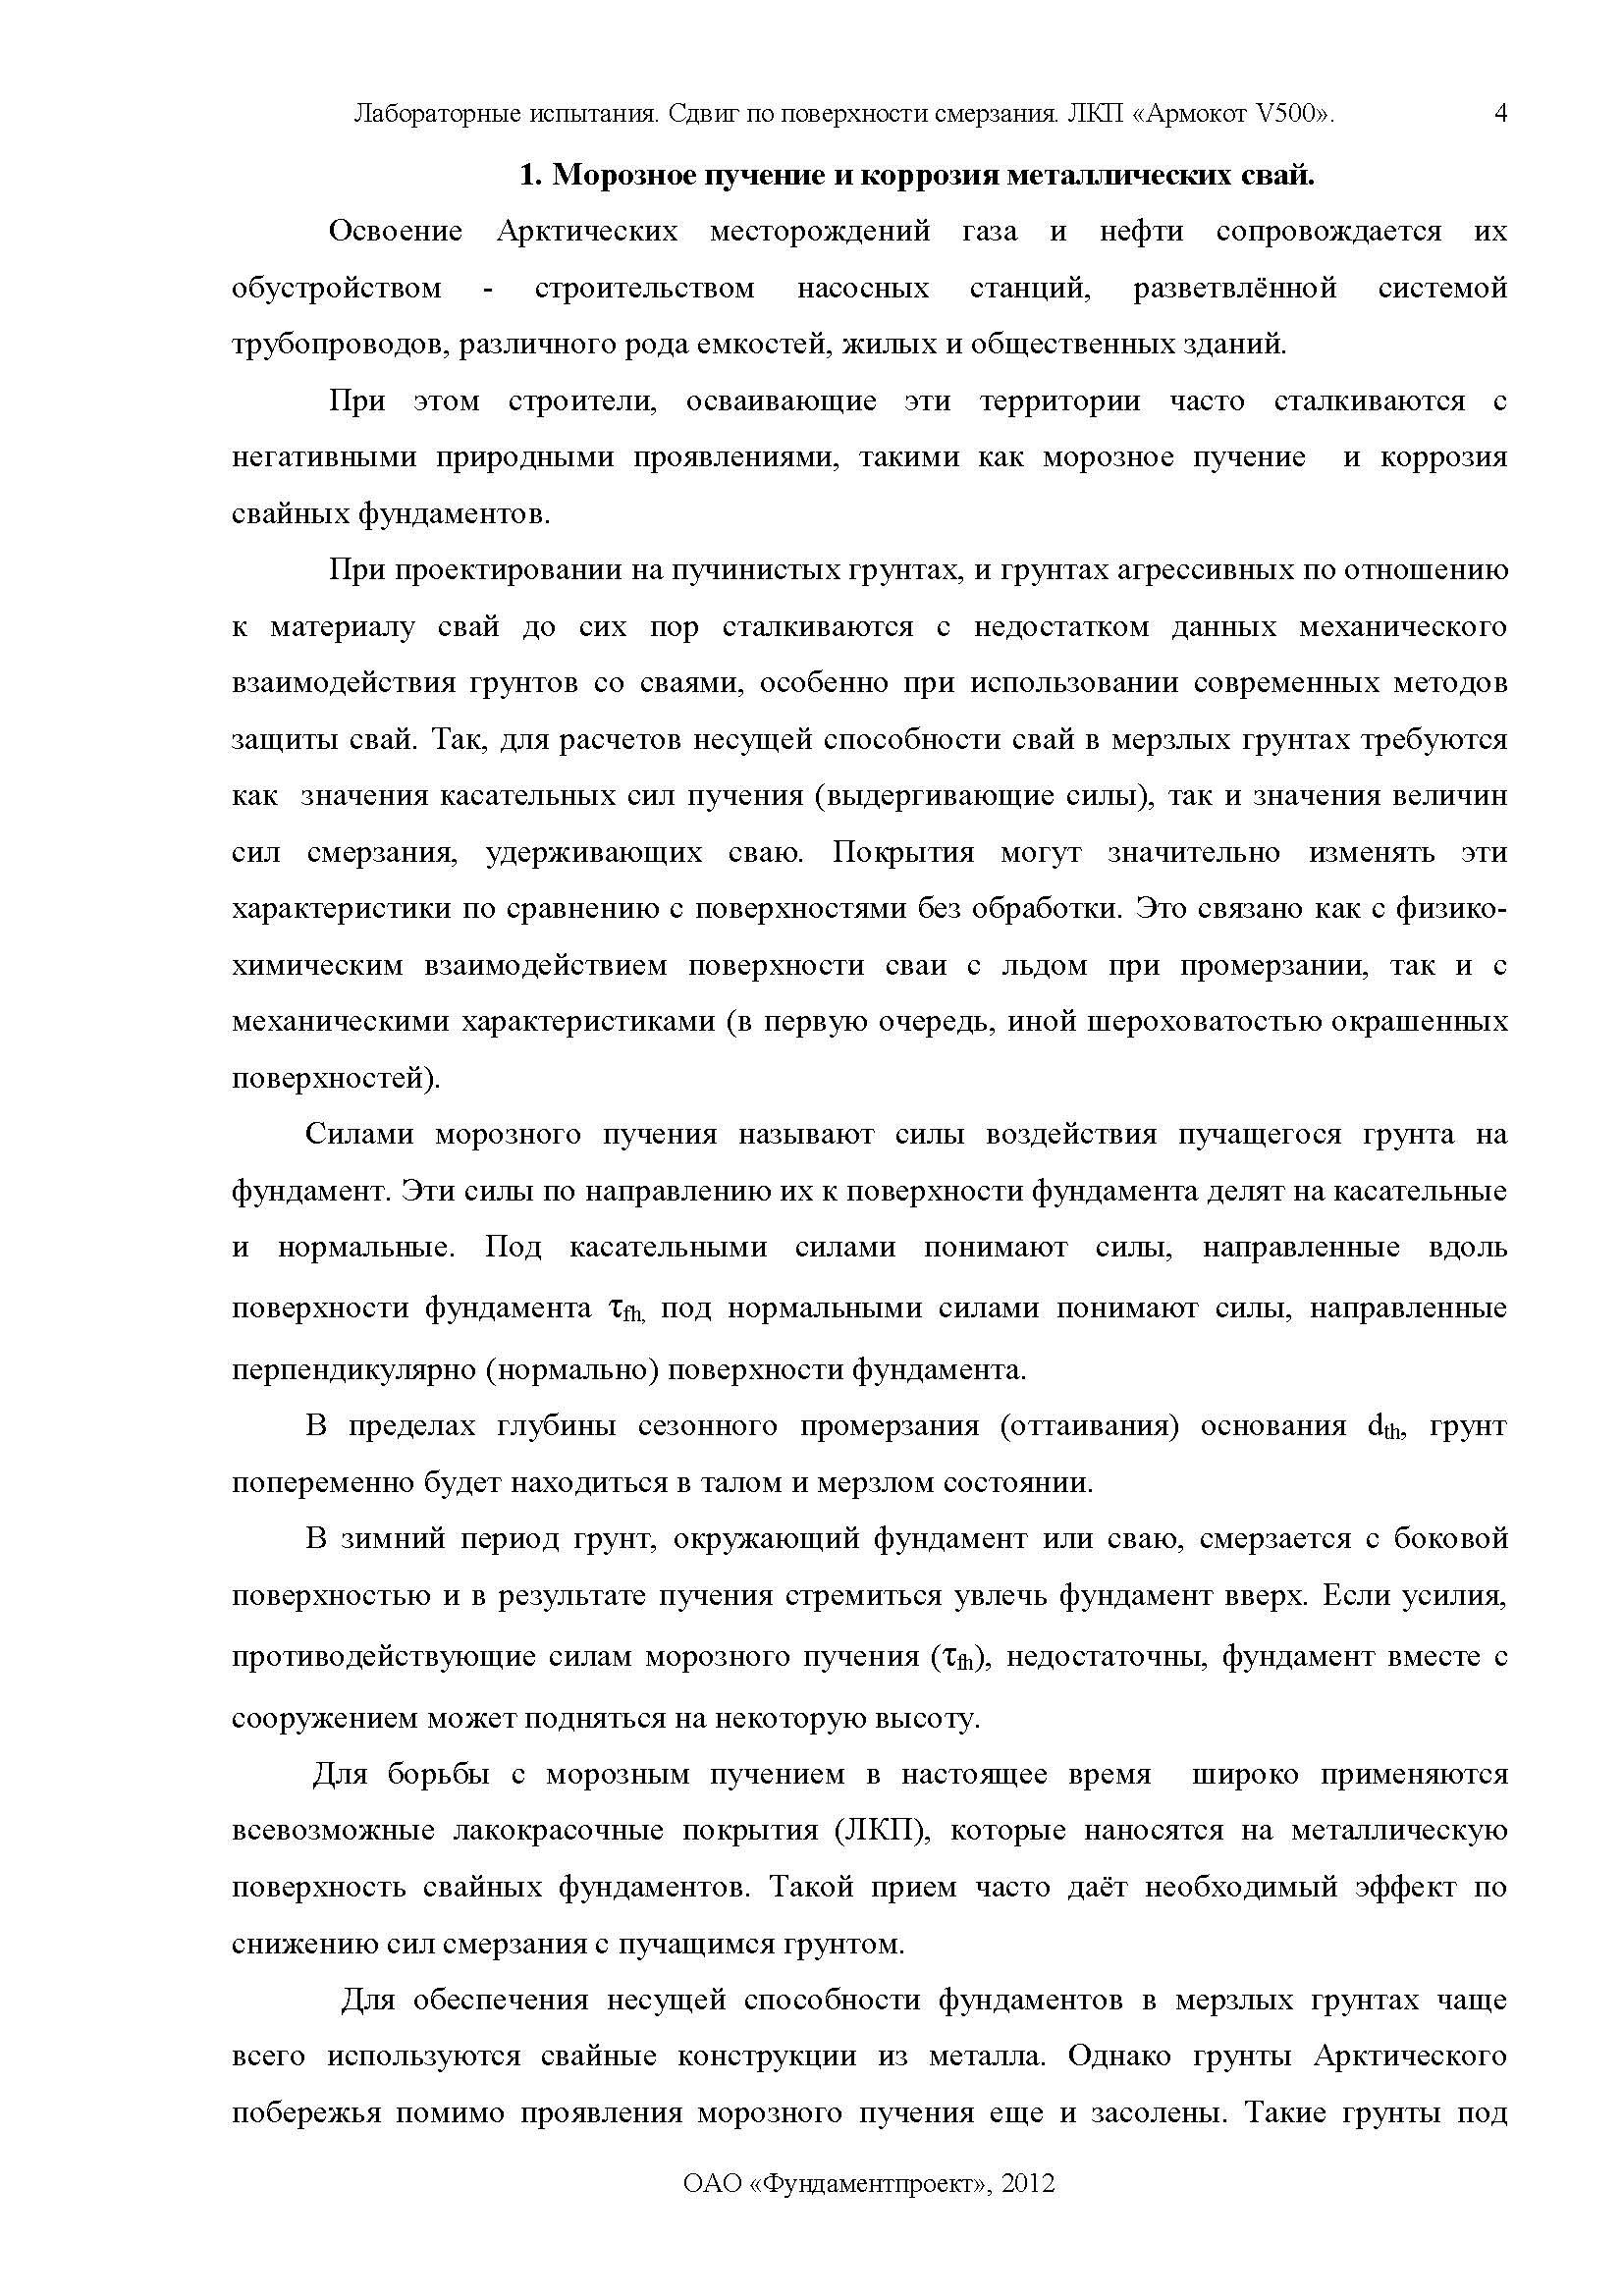 Отчет по сваям Армокот V500 Фундаментпроект_Страница_04